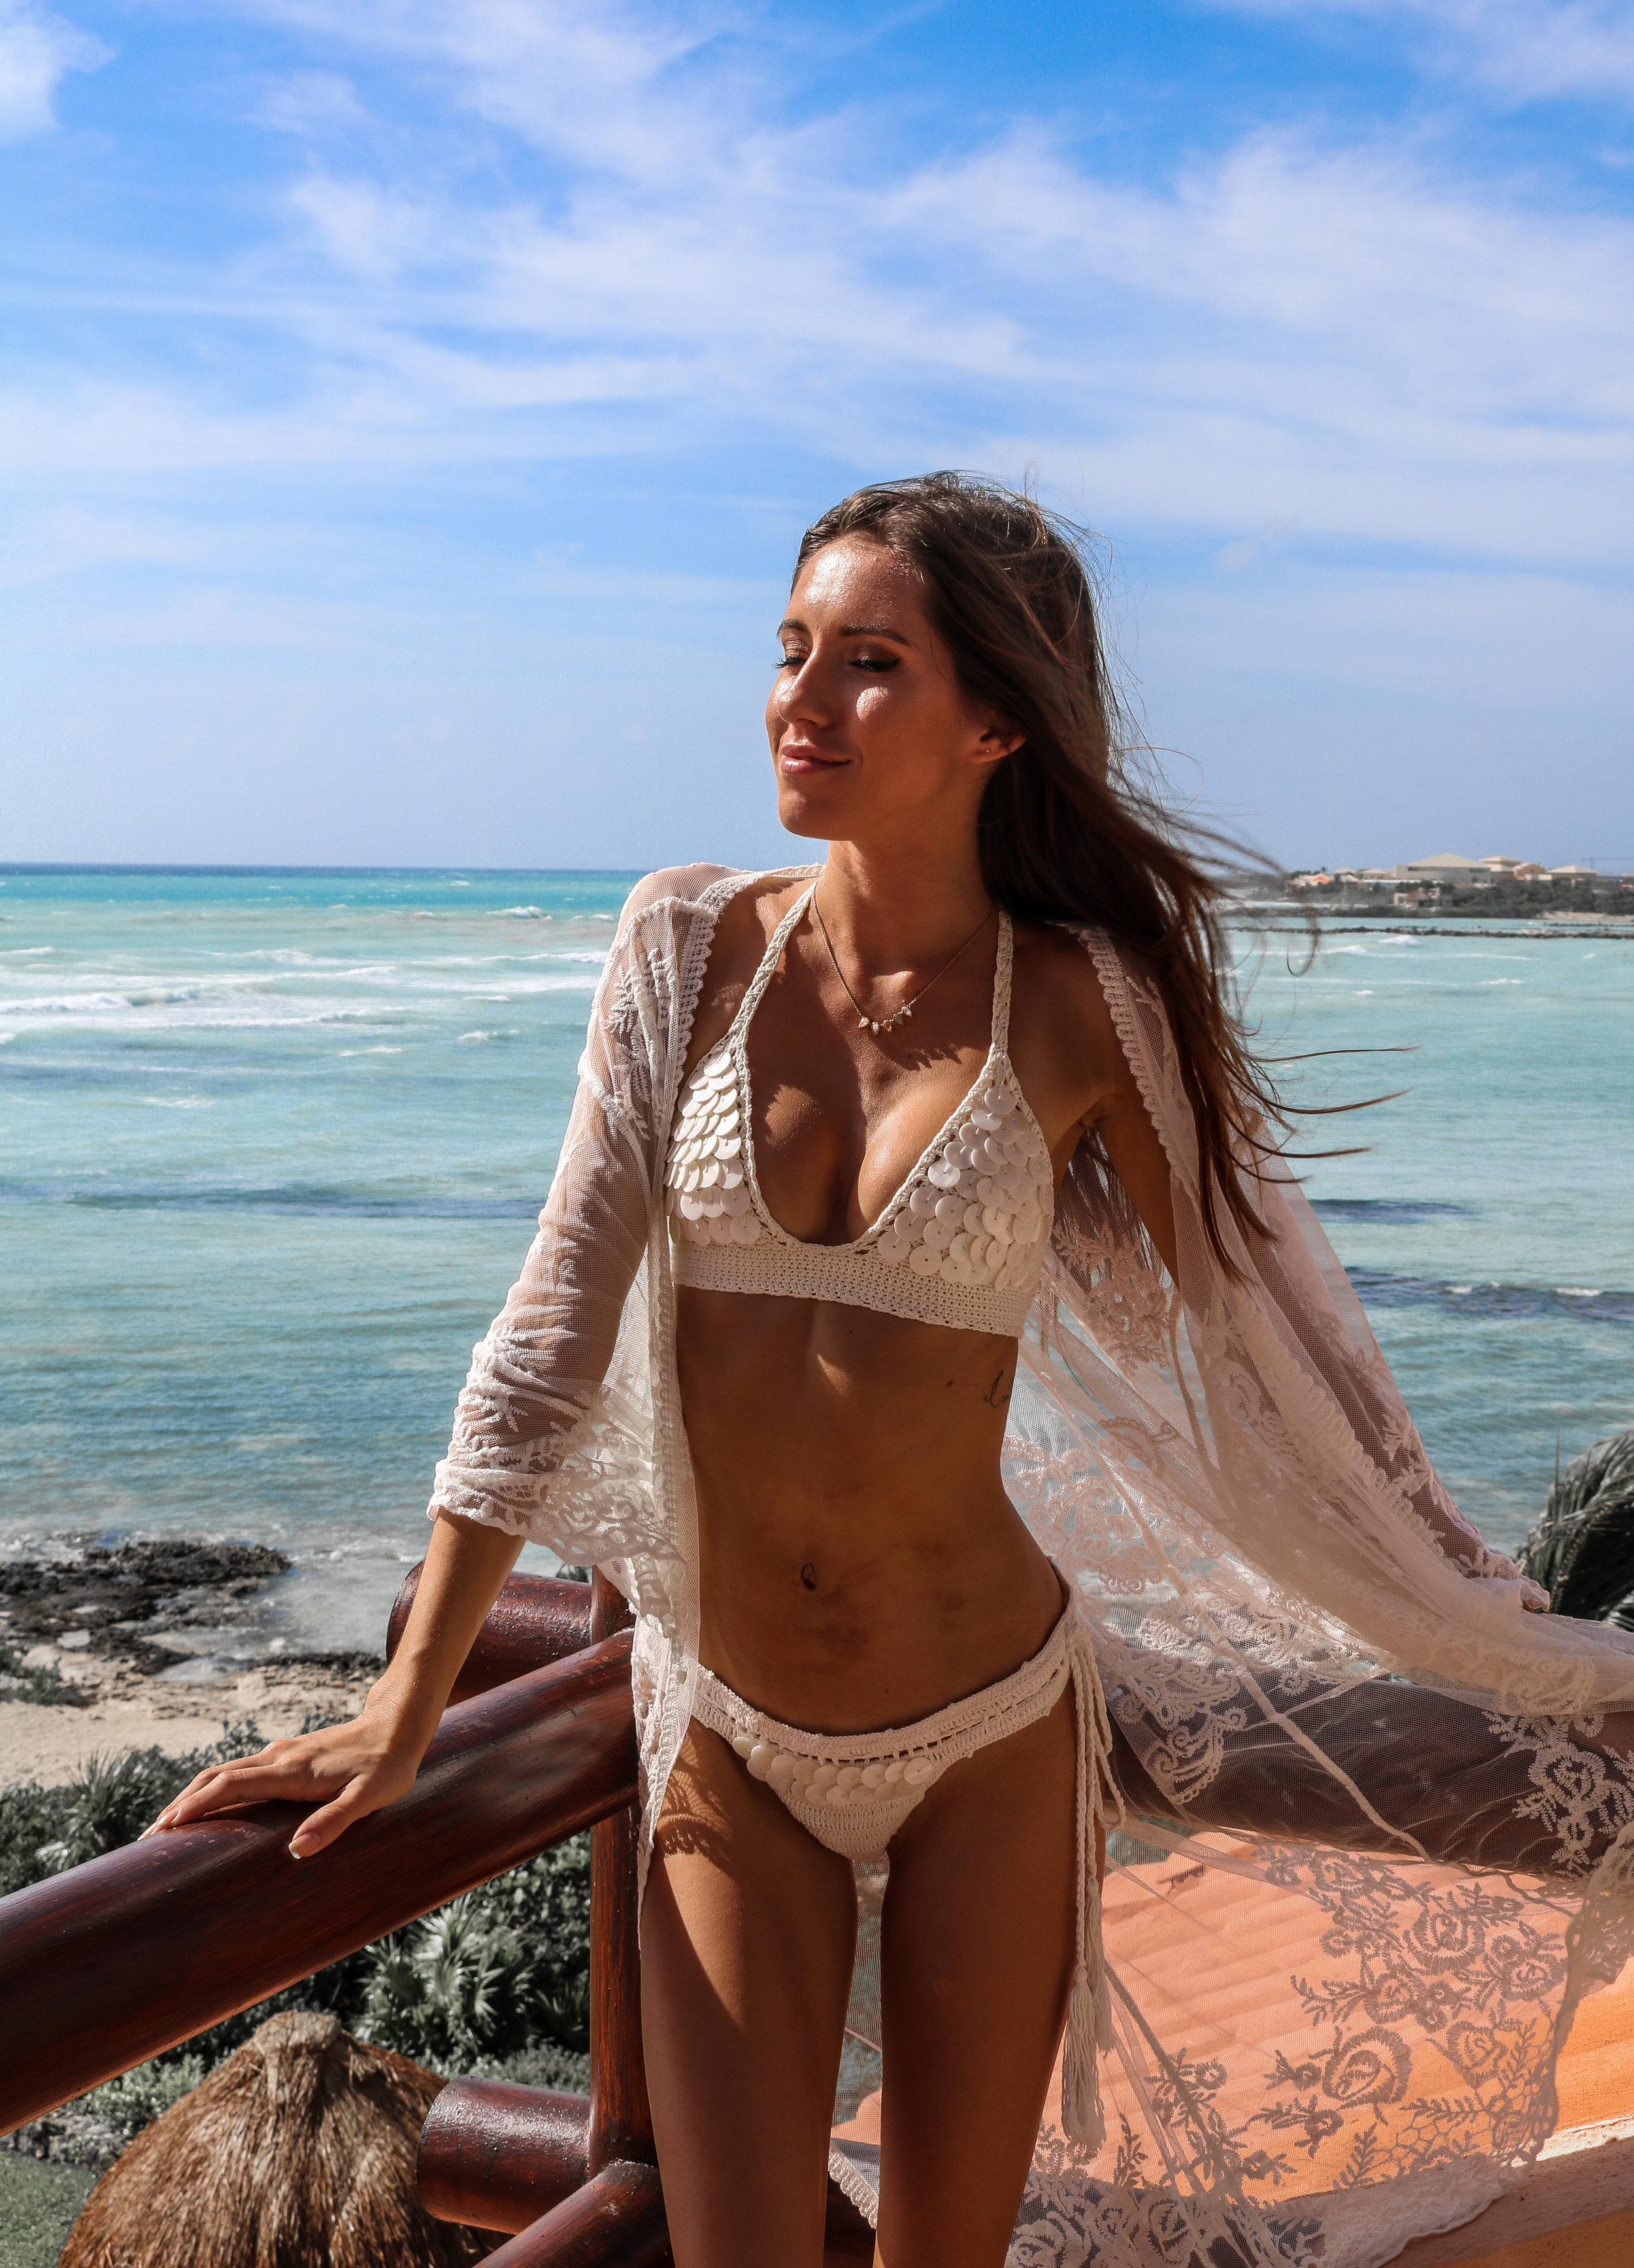 The Hungarian Brunette my 5 favourite bikinis flattering for skinny girls with small boobs - andi bagus shell crochet bikini